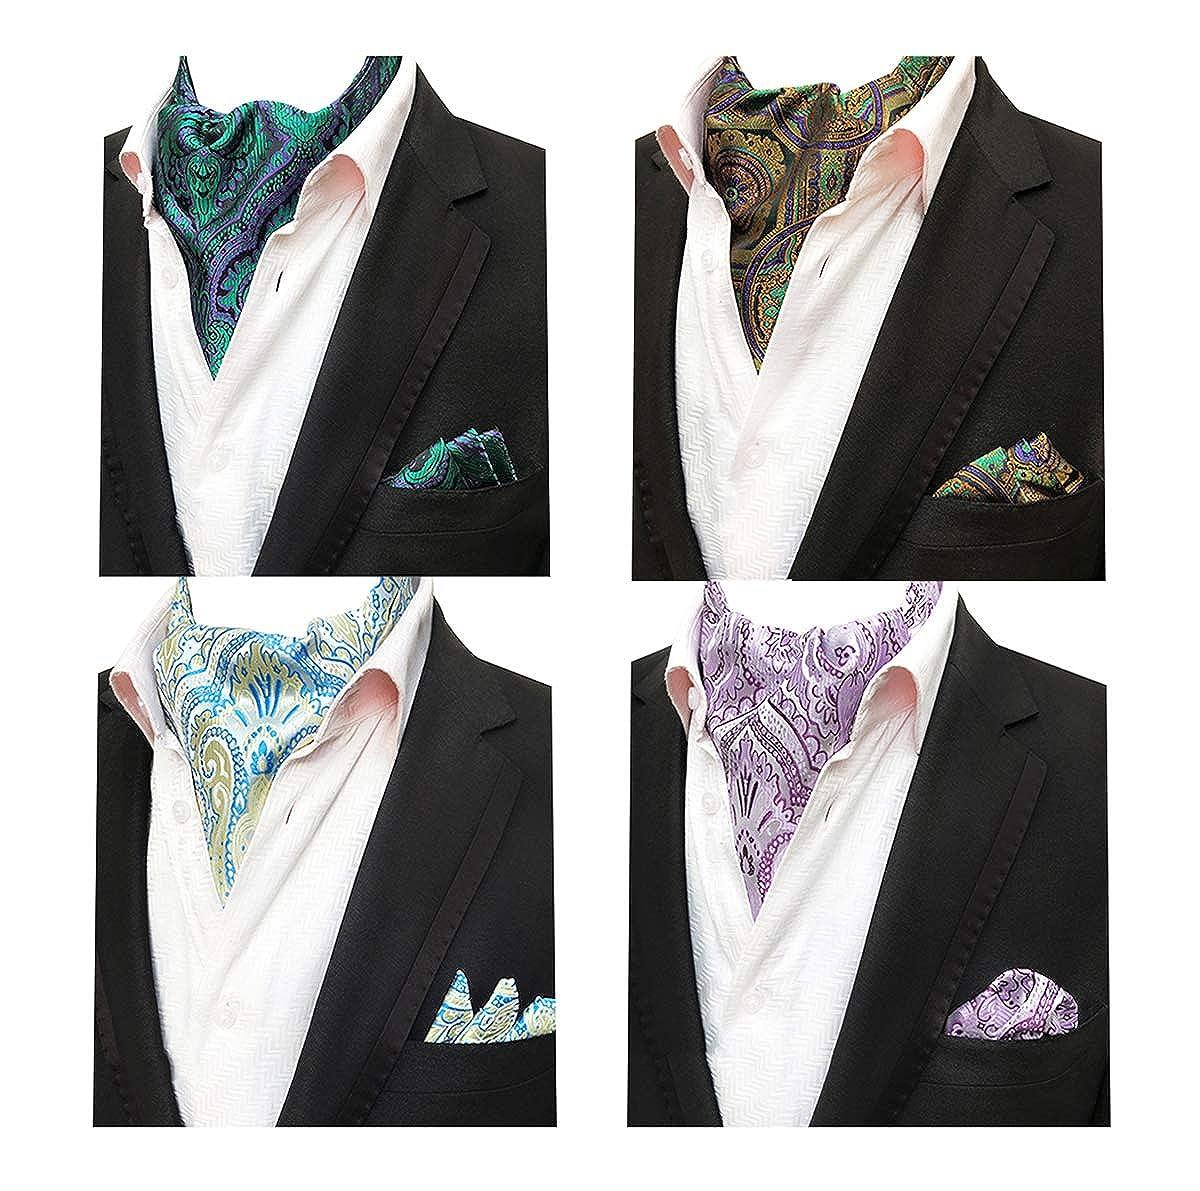 MOHSLEE Mens Exquisite 4 Pack Cravat Floral Ascot Scarf Tie /& Pocket Square Set